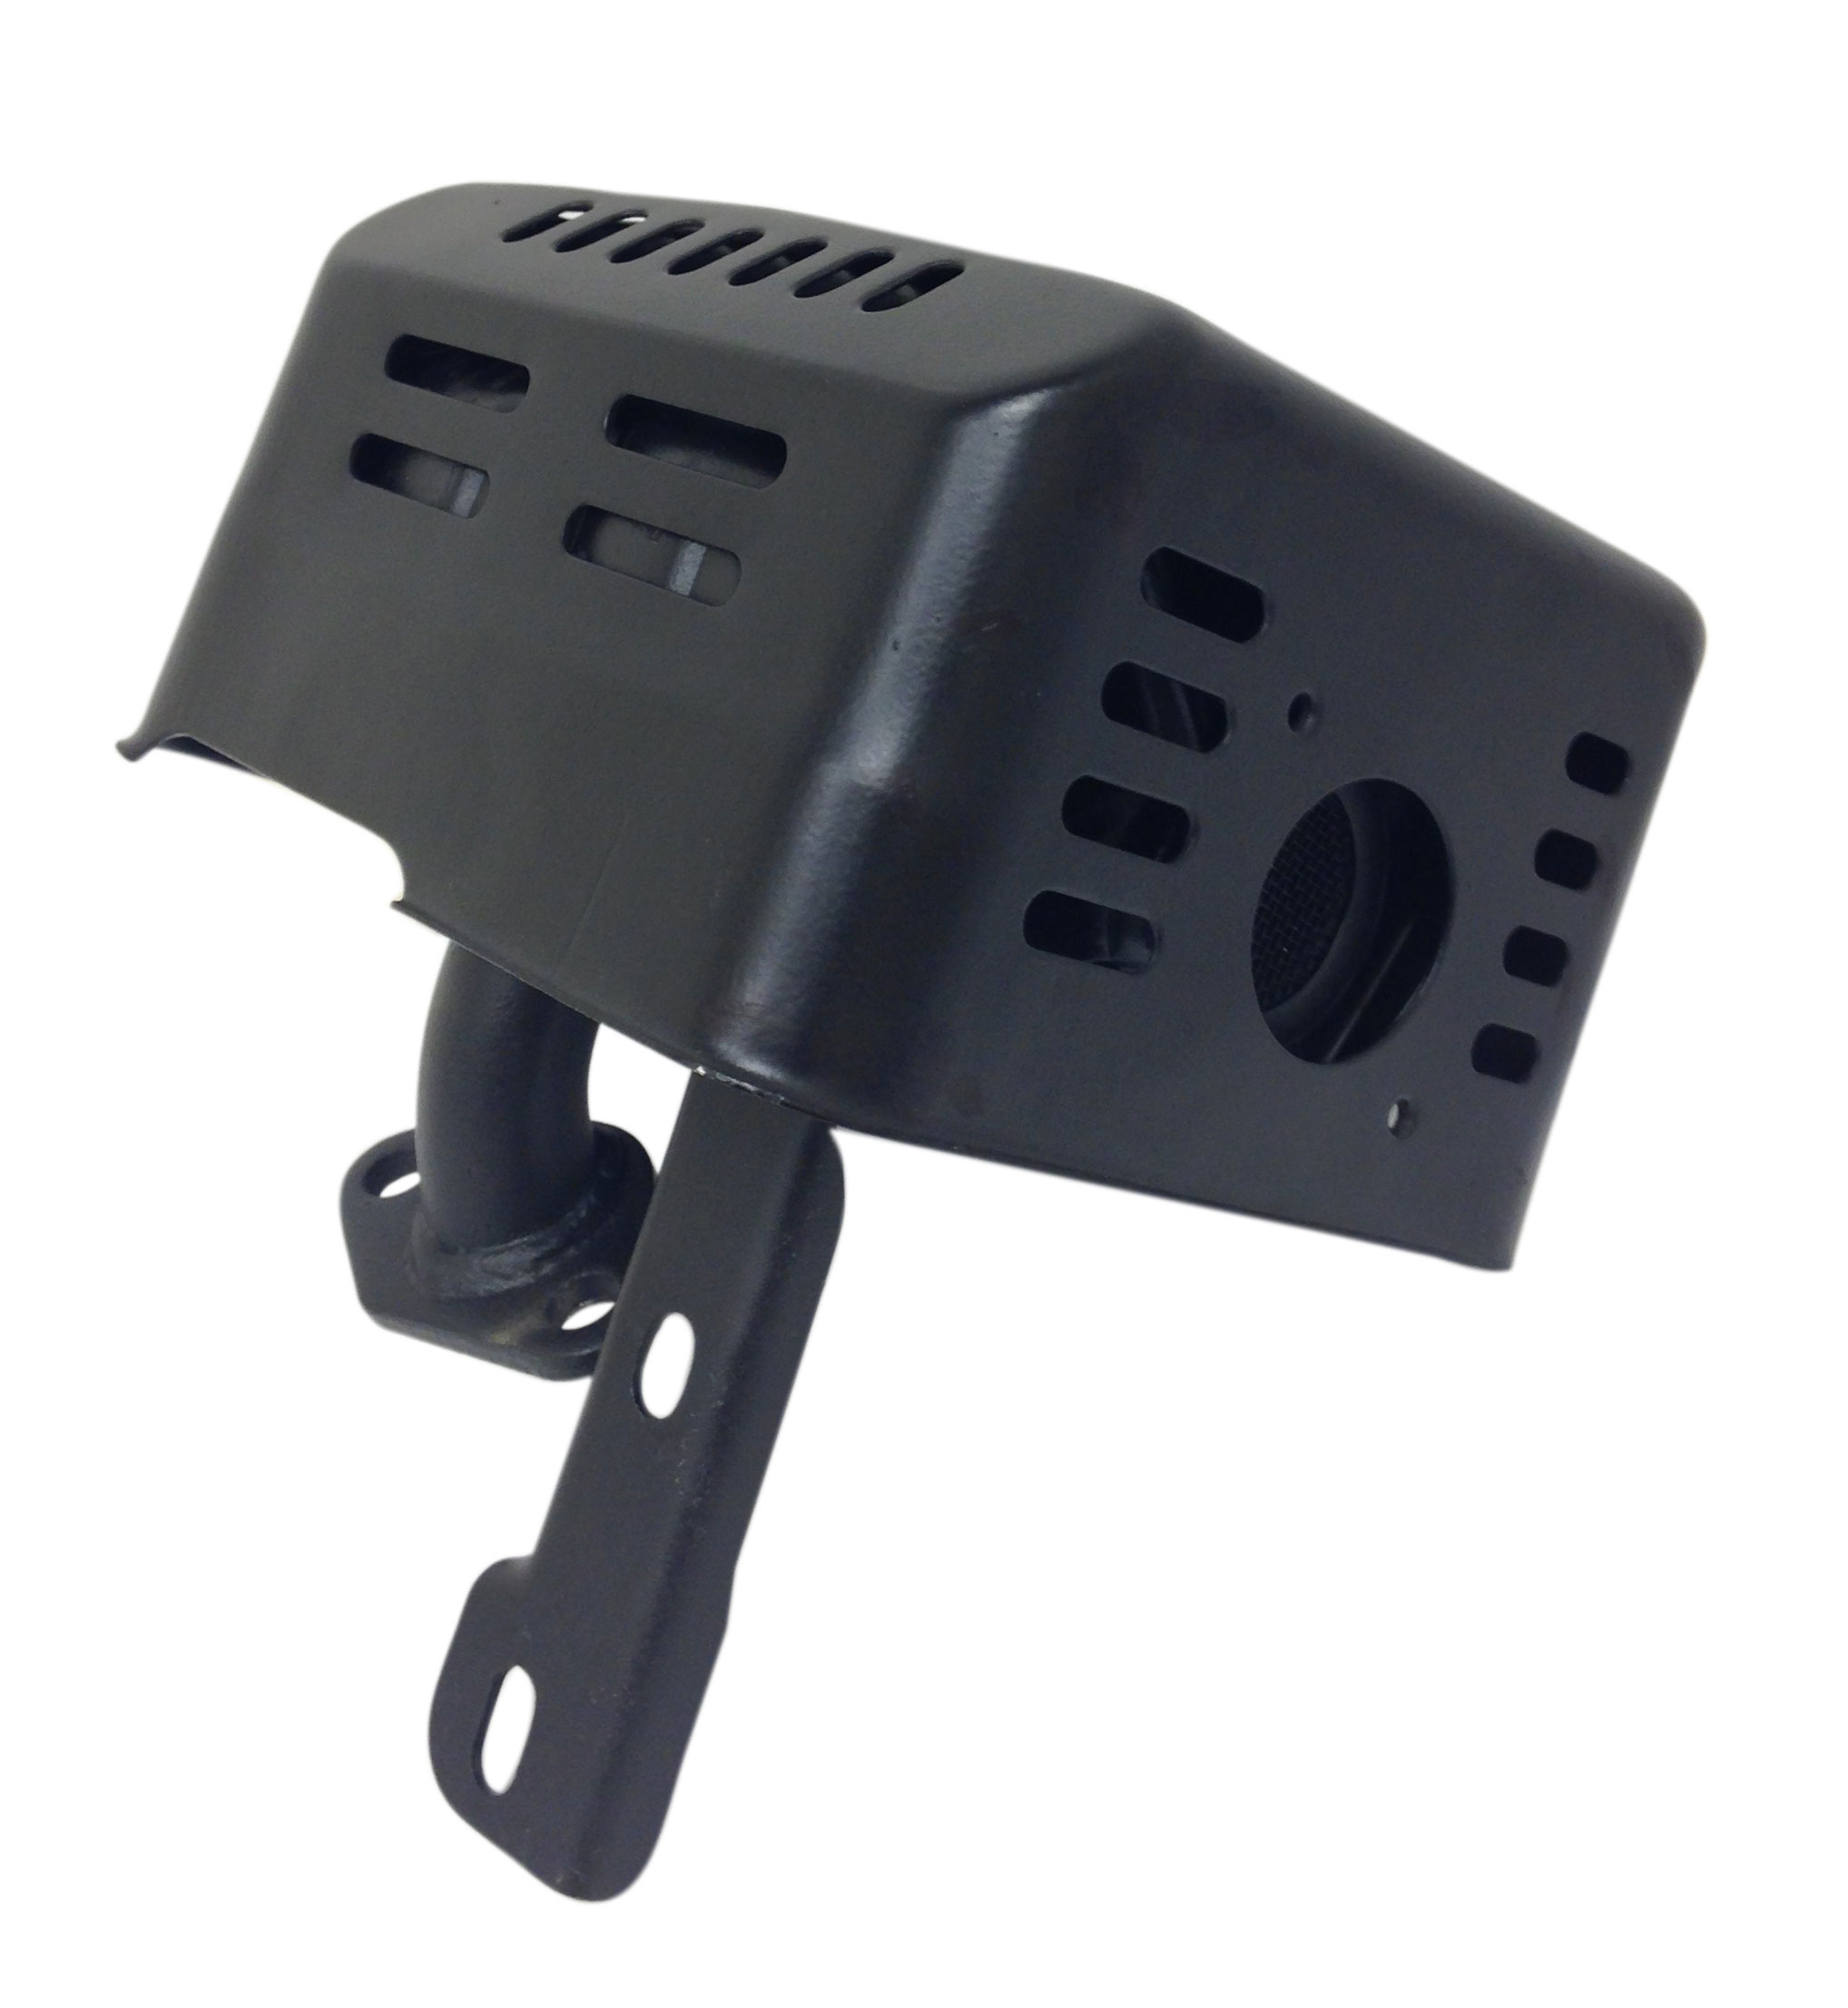 Stock Muffler for Honda GX200 Engine 6 5 HP or 196cc Clone